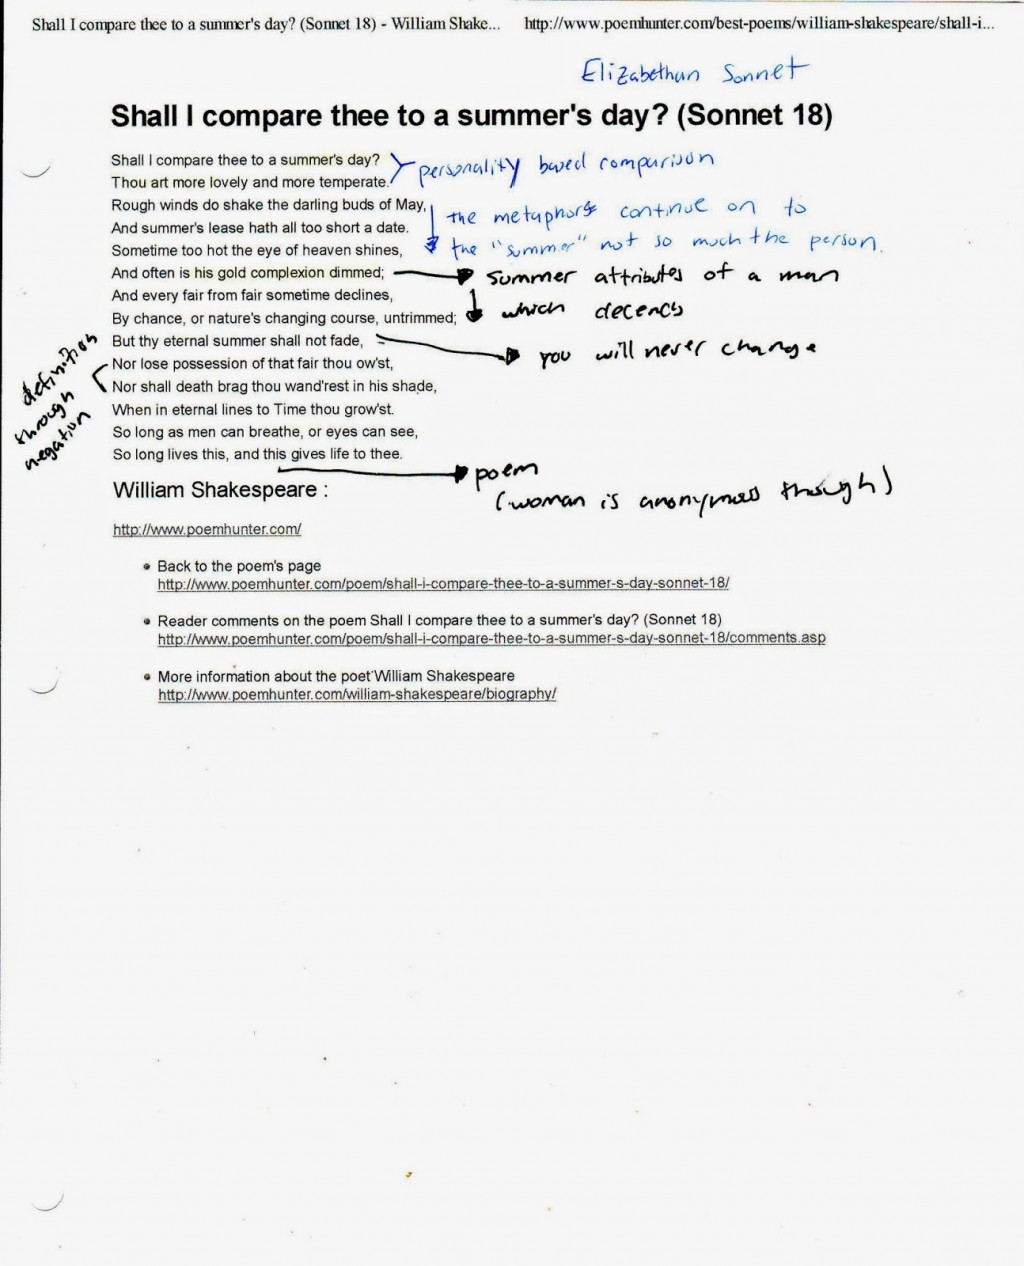 002 Essay Example Rare Shakespeare Hamlet Topics Macbeth Examples Titles Large